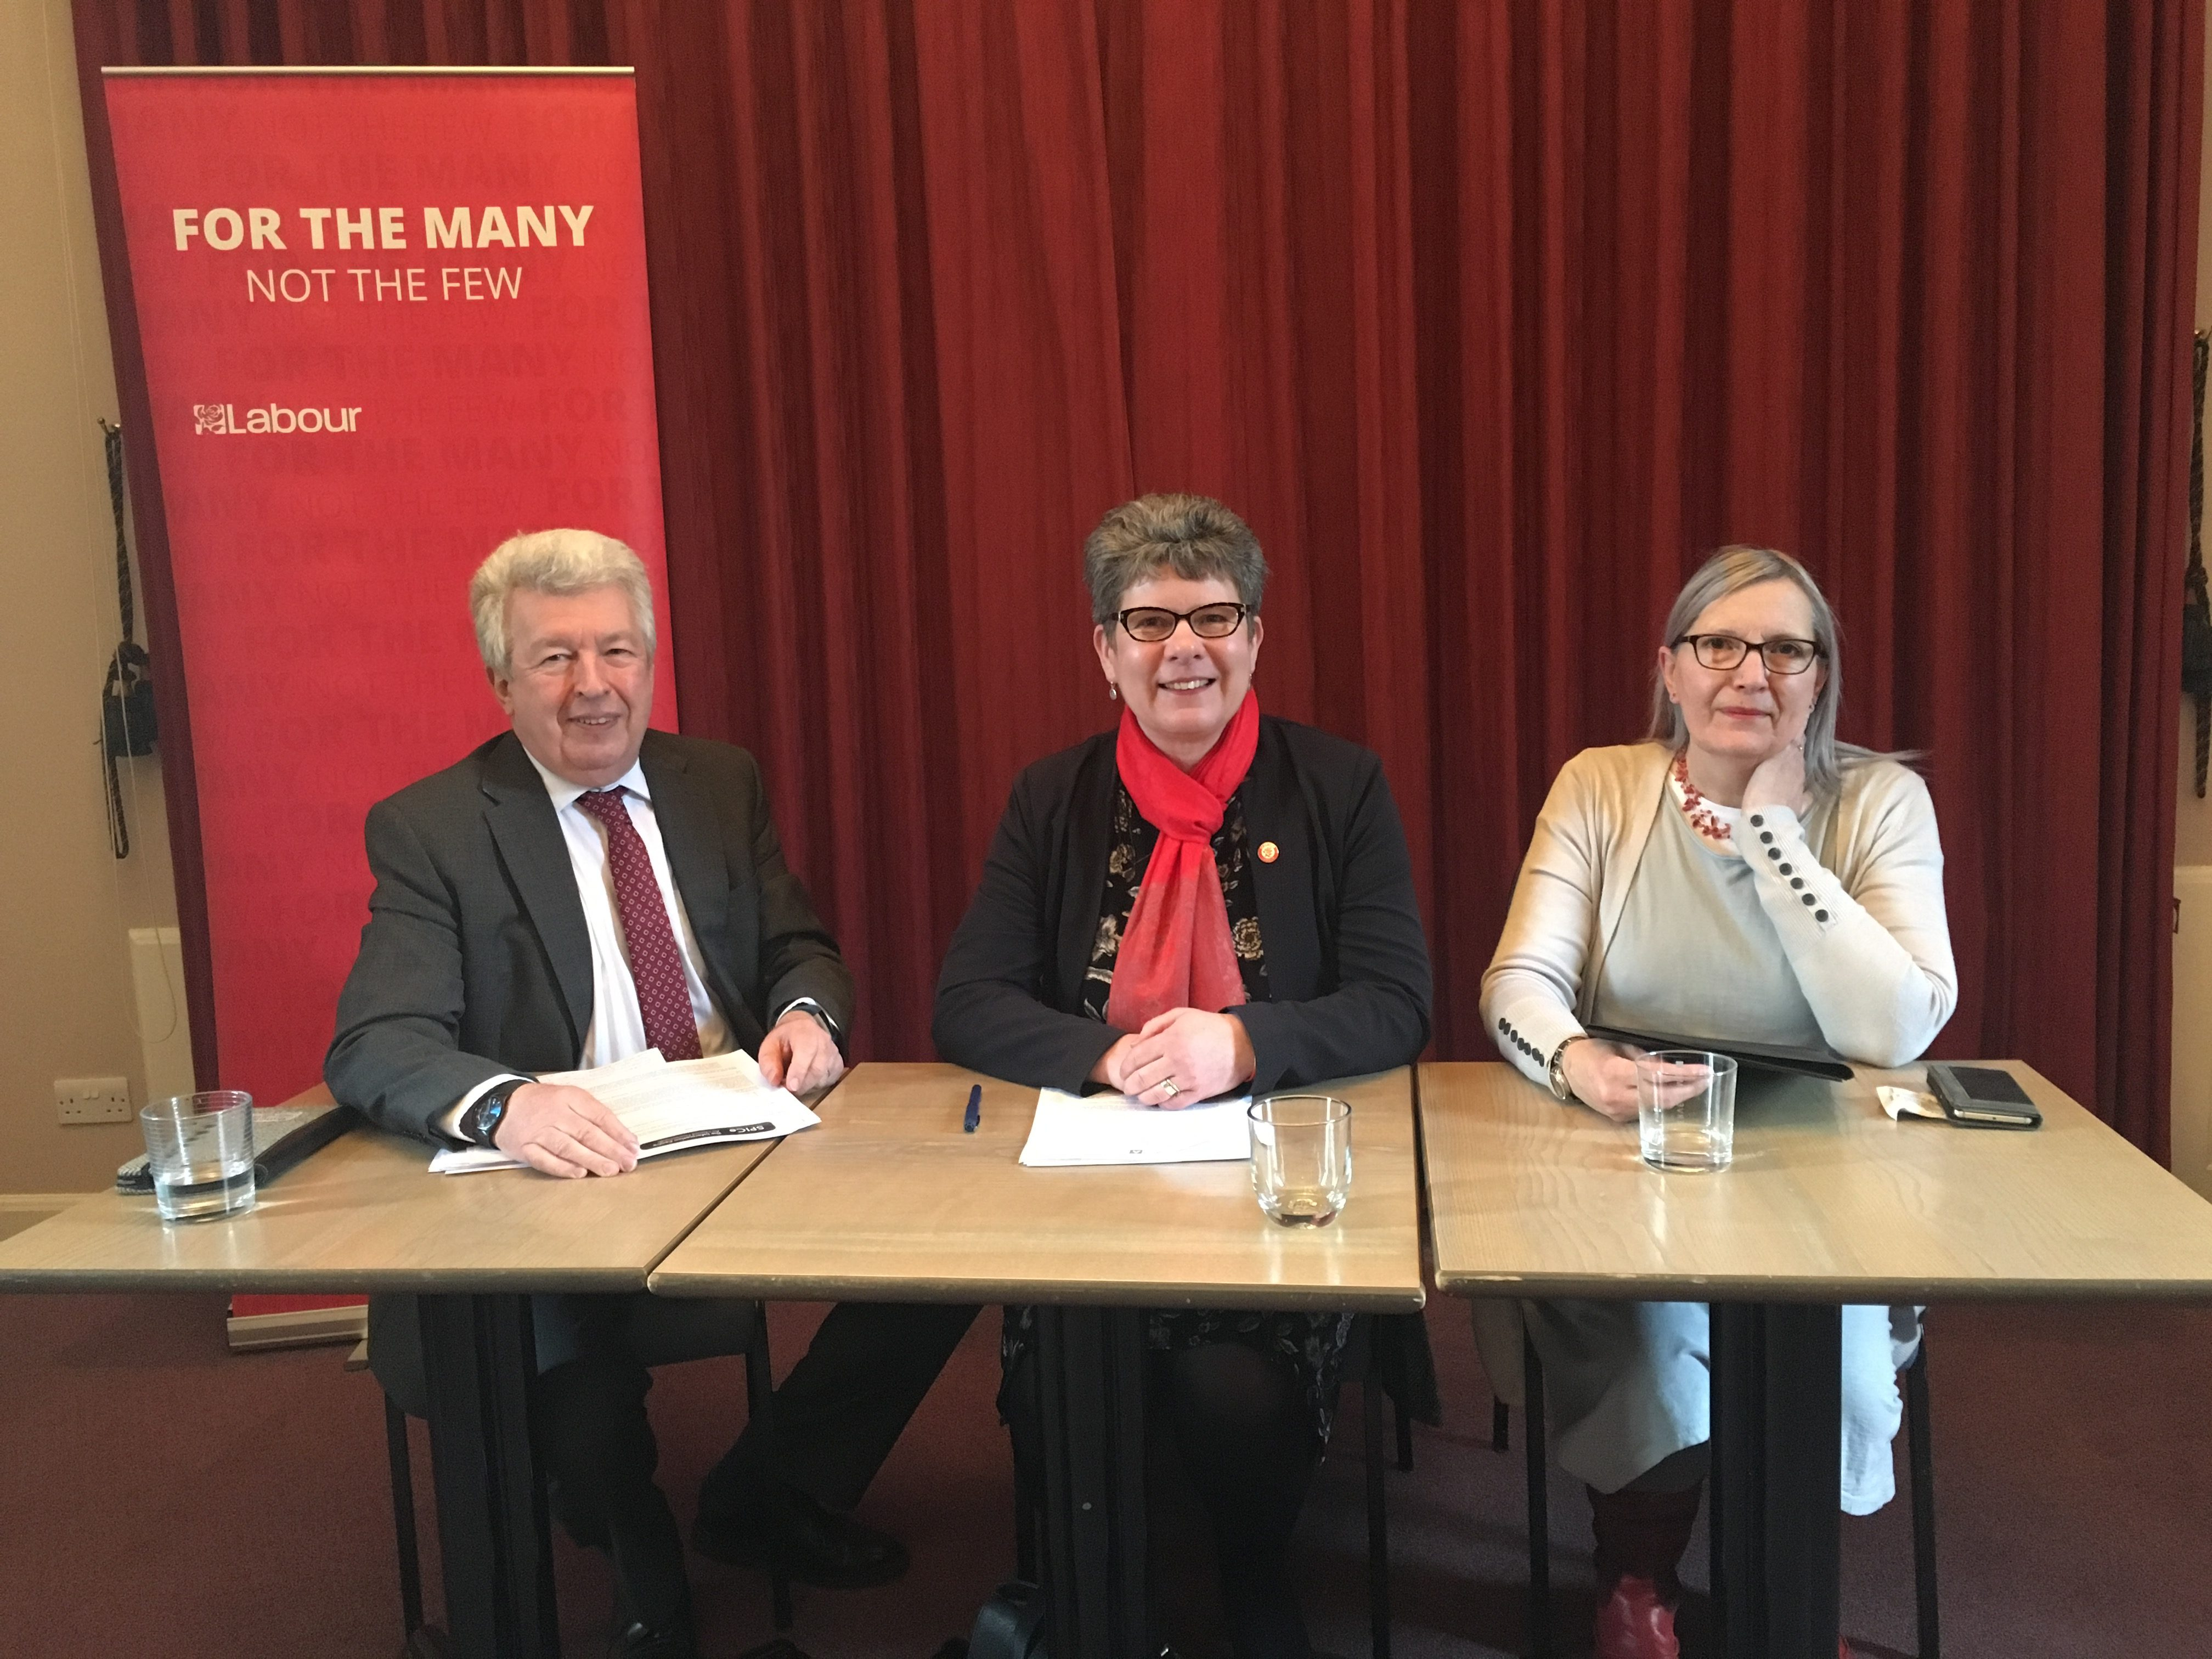 Lewis Macdonald MSP, Councillor Alison Evison and Sarah Flavell